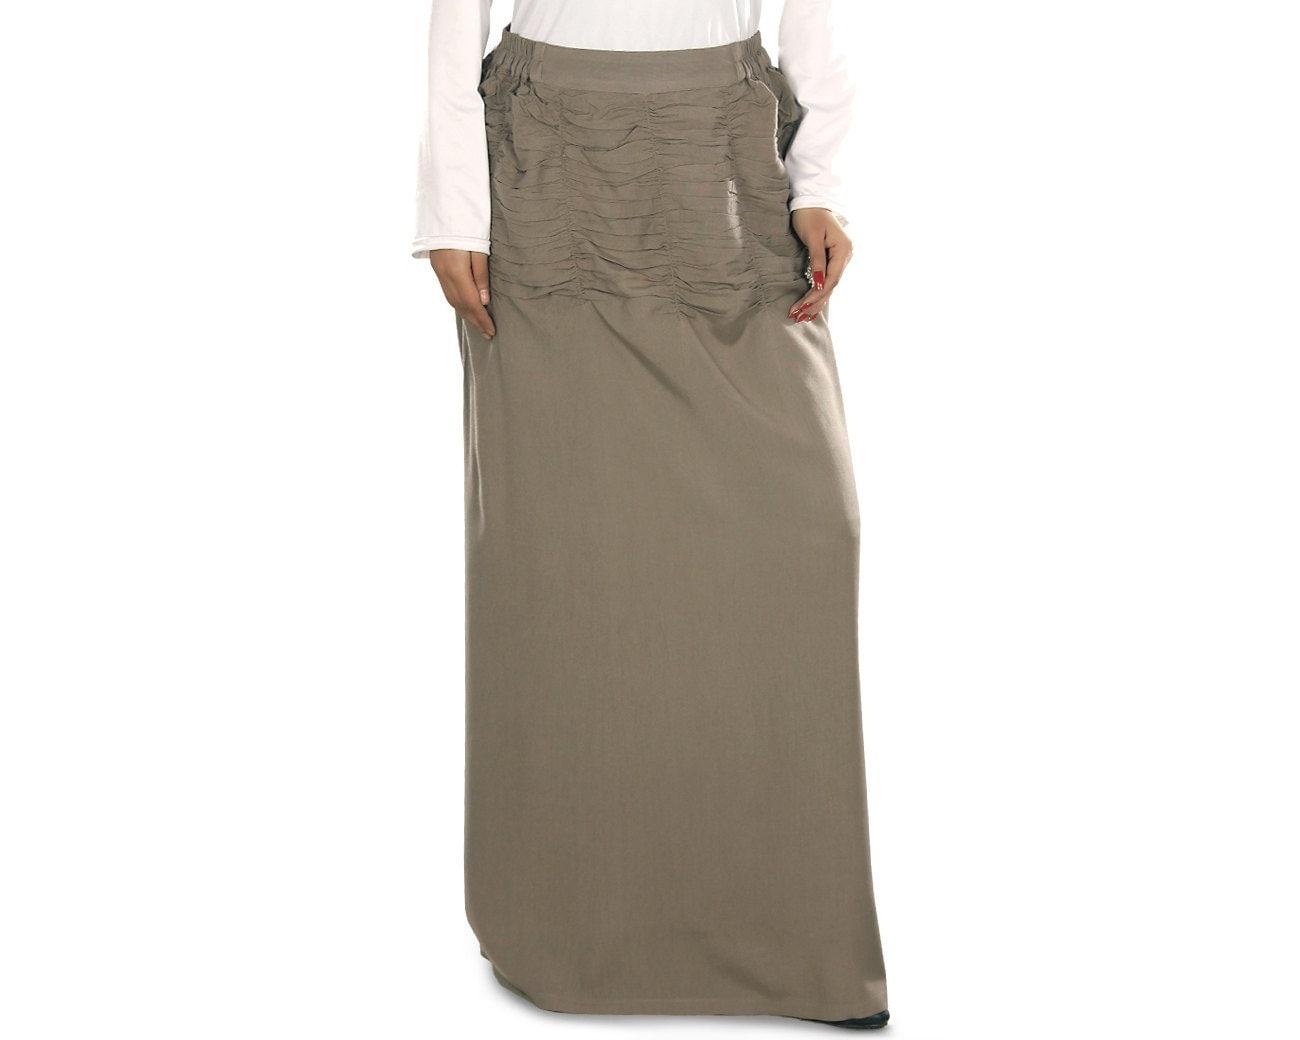 Khaki skirt | Etsy